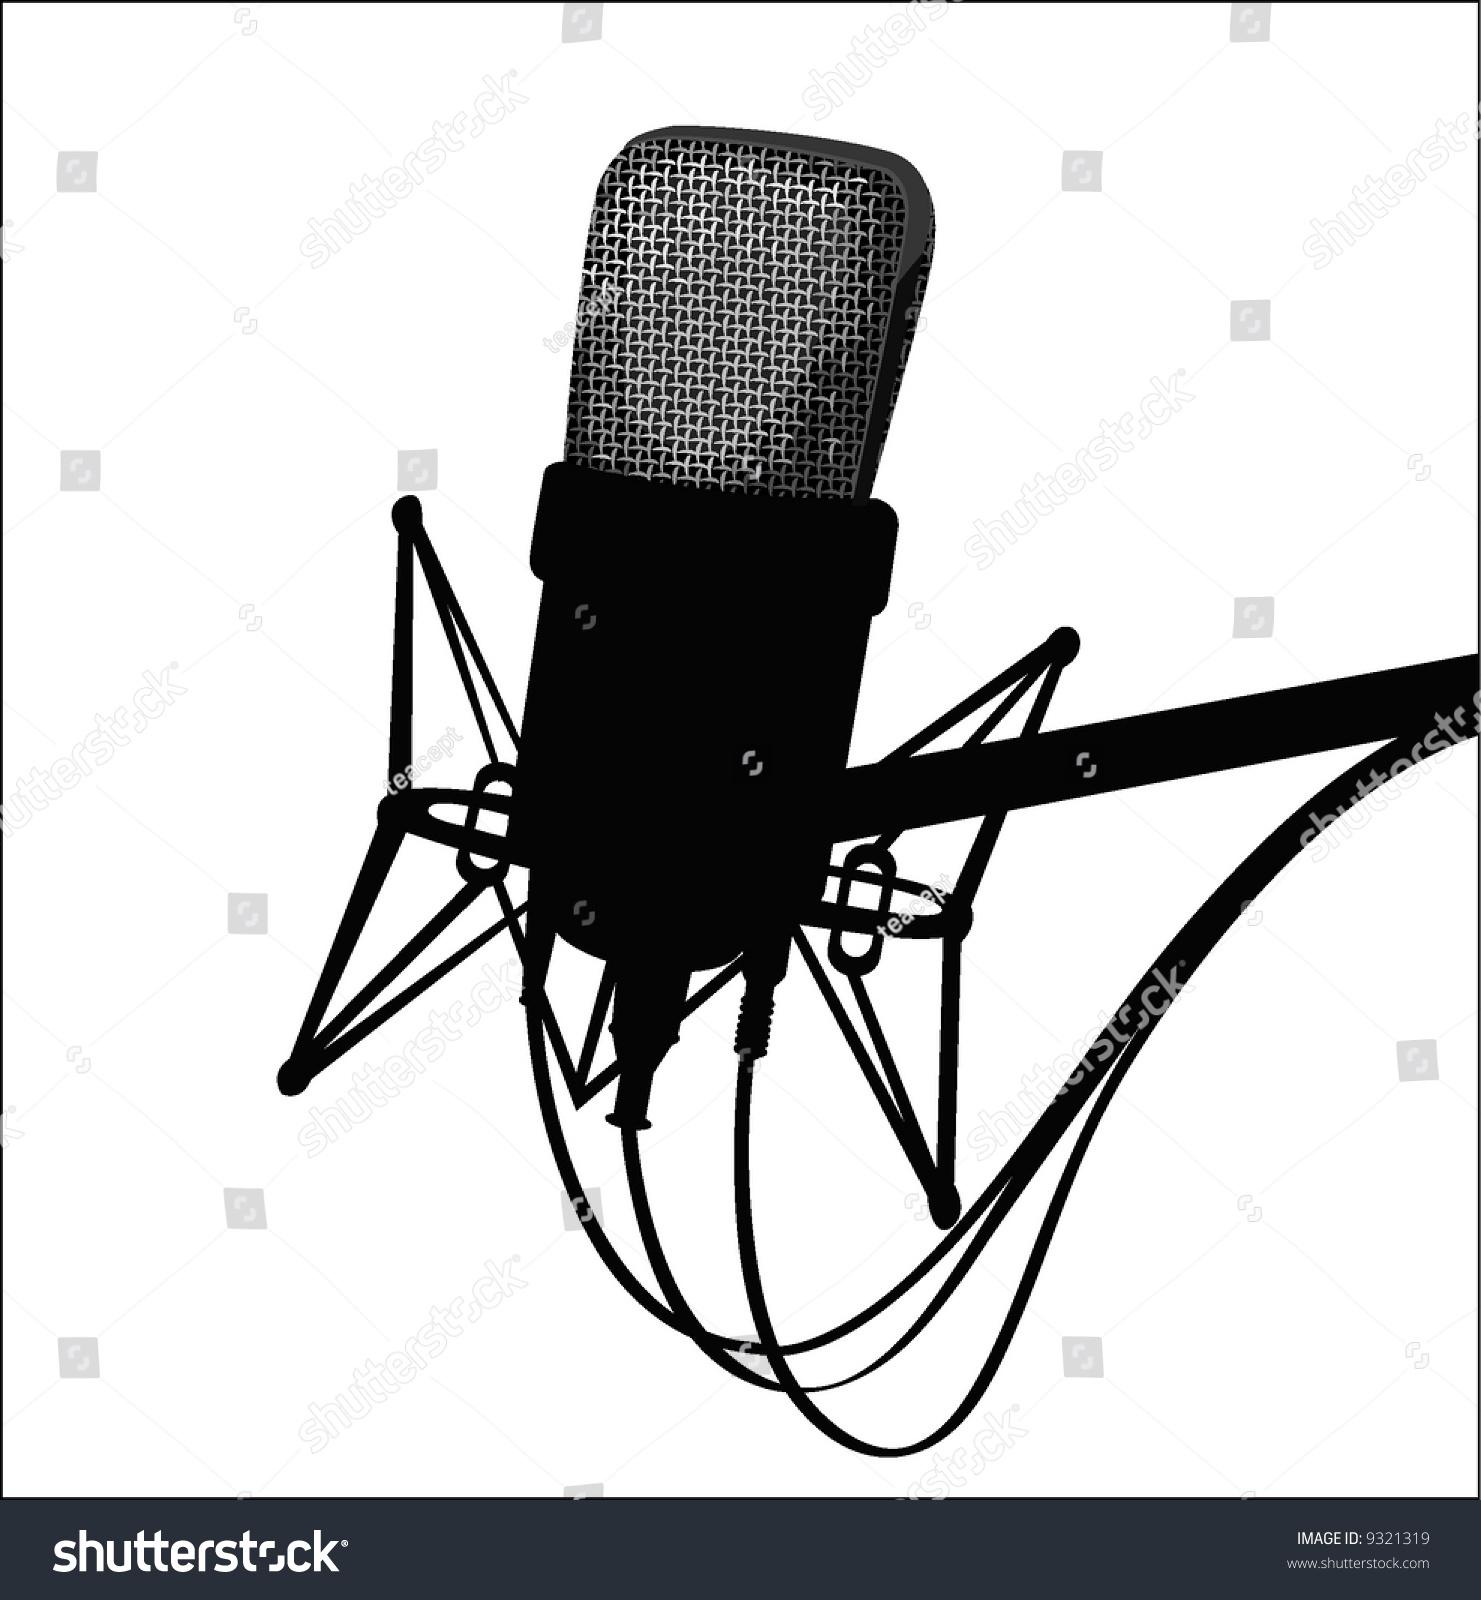 iron rocking chair kids outdoor lounge studio microphoneblack white stock vector 9321319 - shutterstock